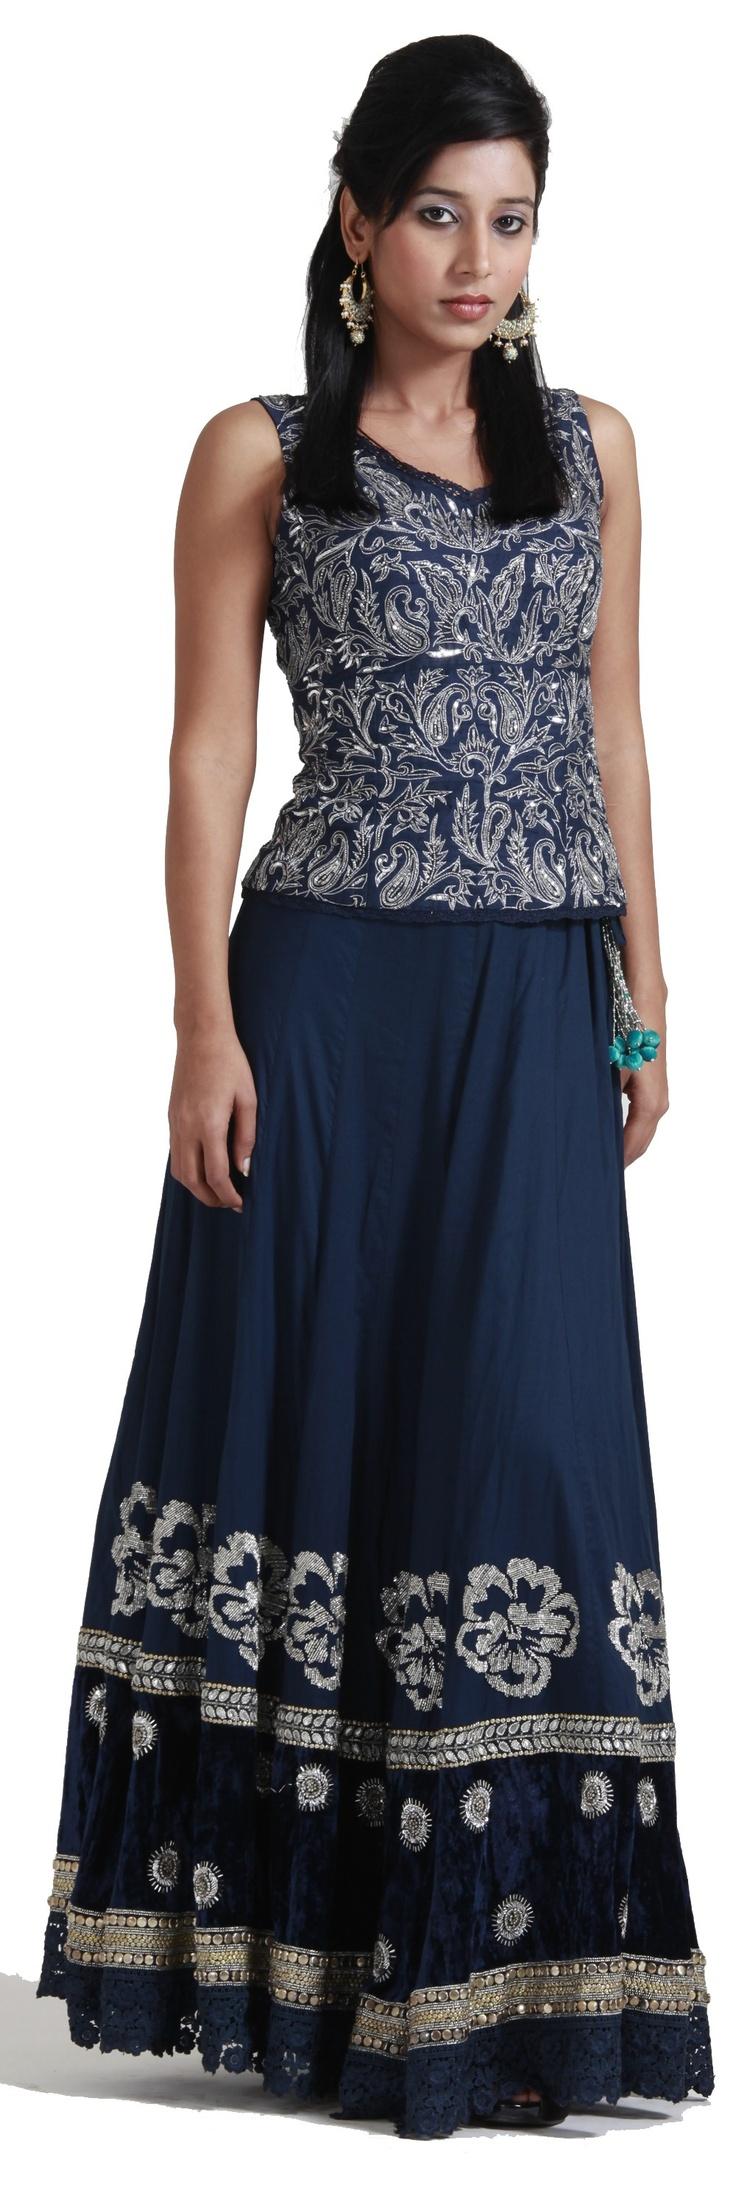 Blue embroidered lehenga choli - #LEHENGAS - #WOMEN'SWEAR